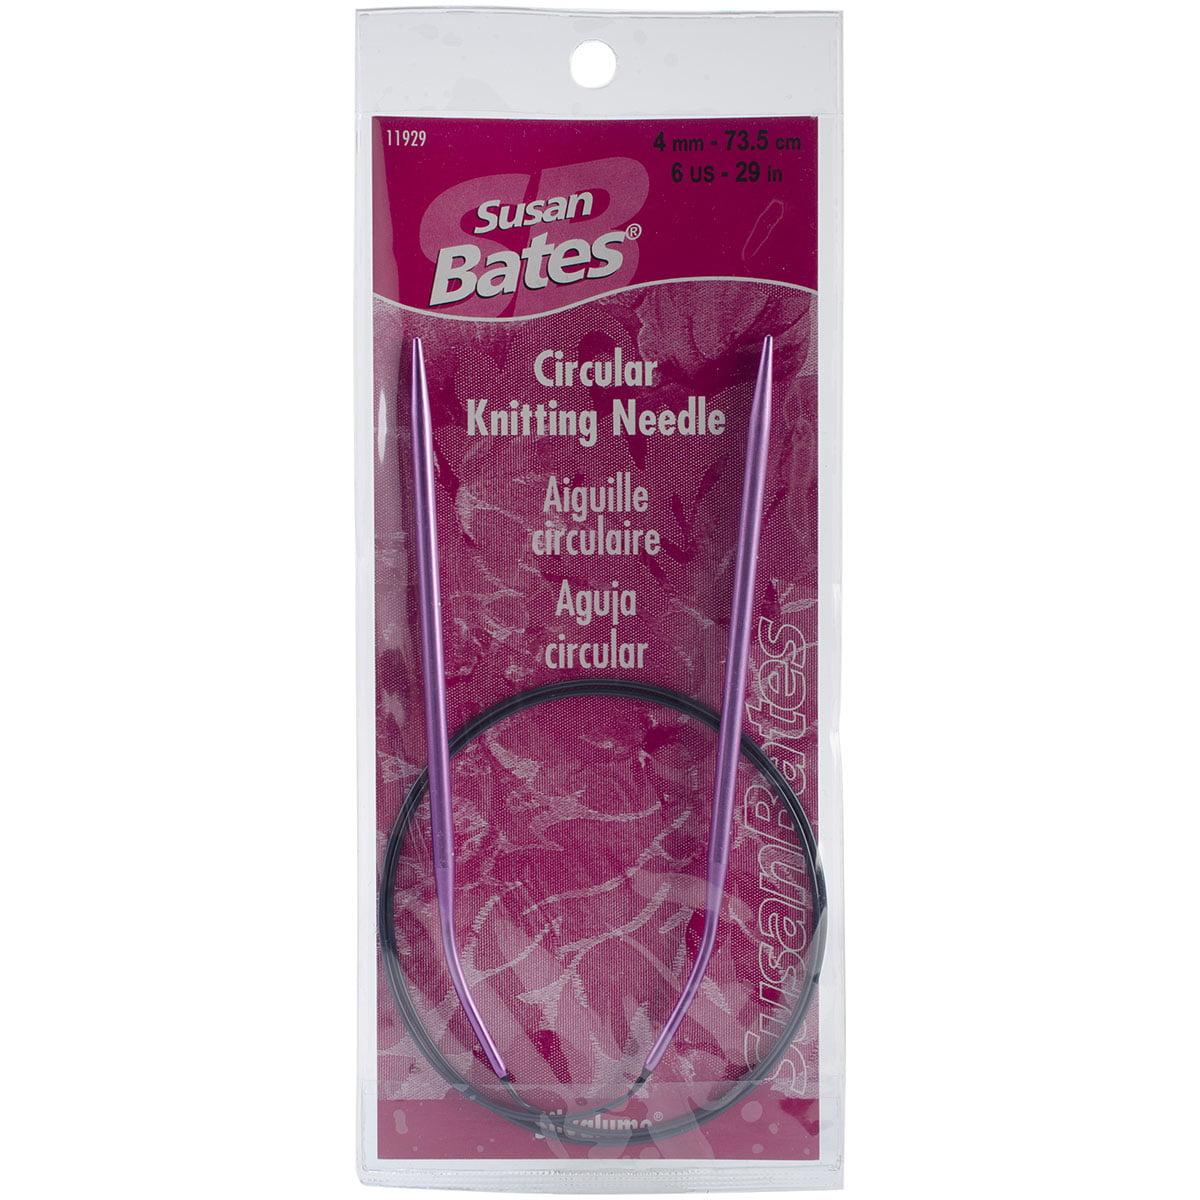 "Susan Bates Silvalume Circular Knitting Needles 29""-Size 6/4mm"